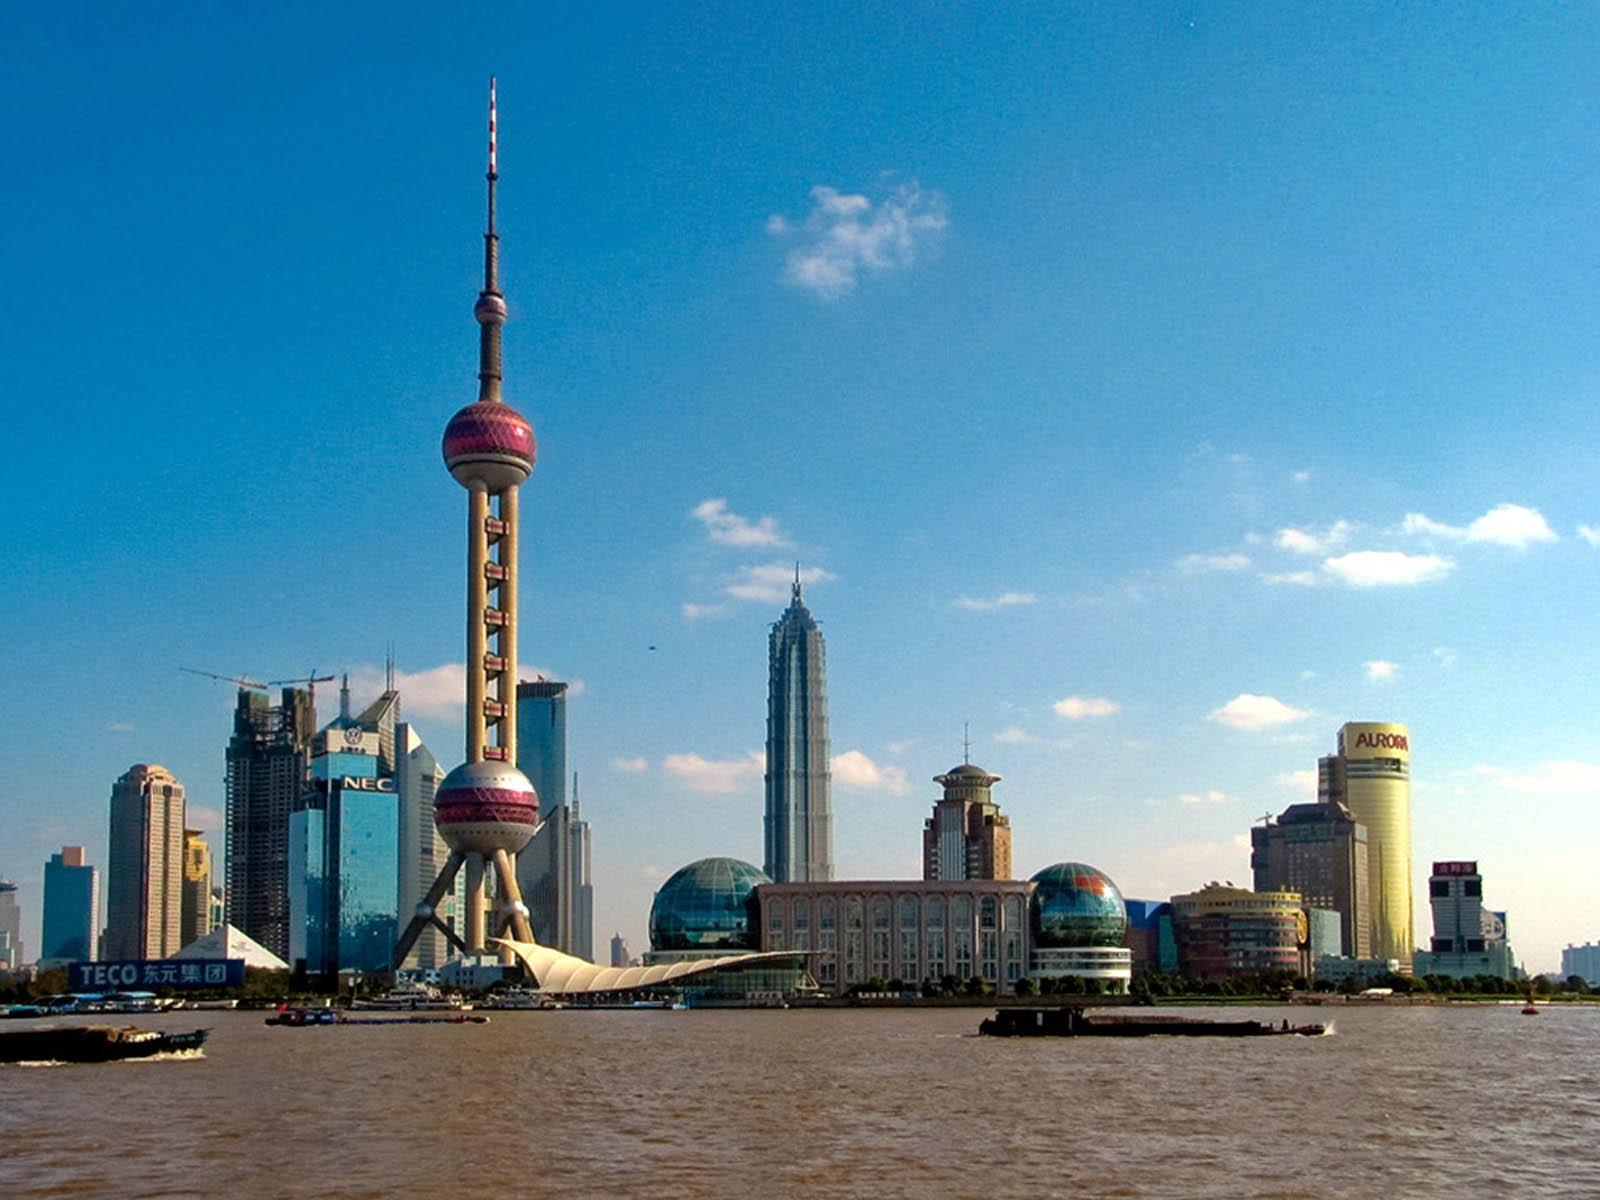 Skyline Car Wallpaper Hd Wallpapers China Shanghai Tv Tower Wallpapers